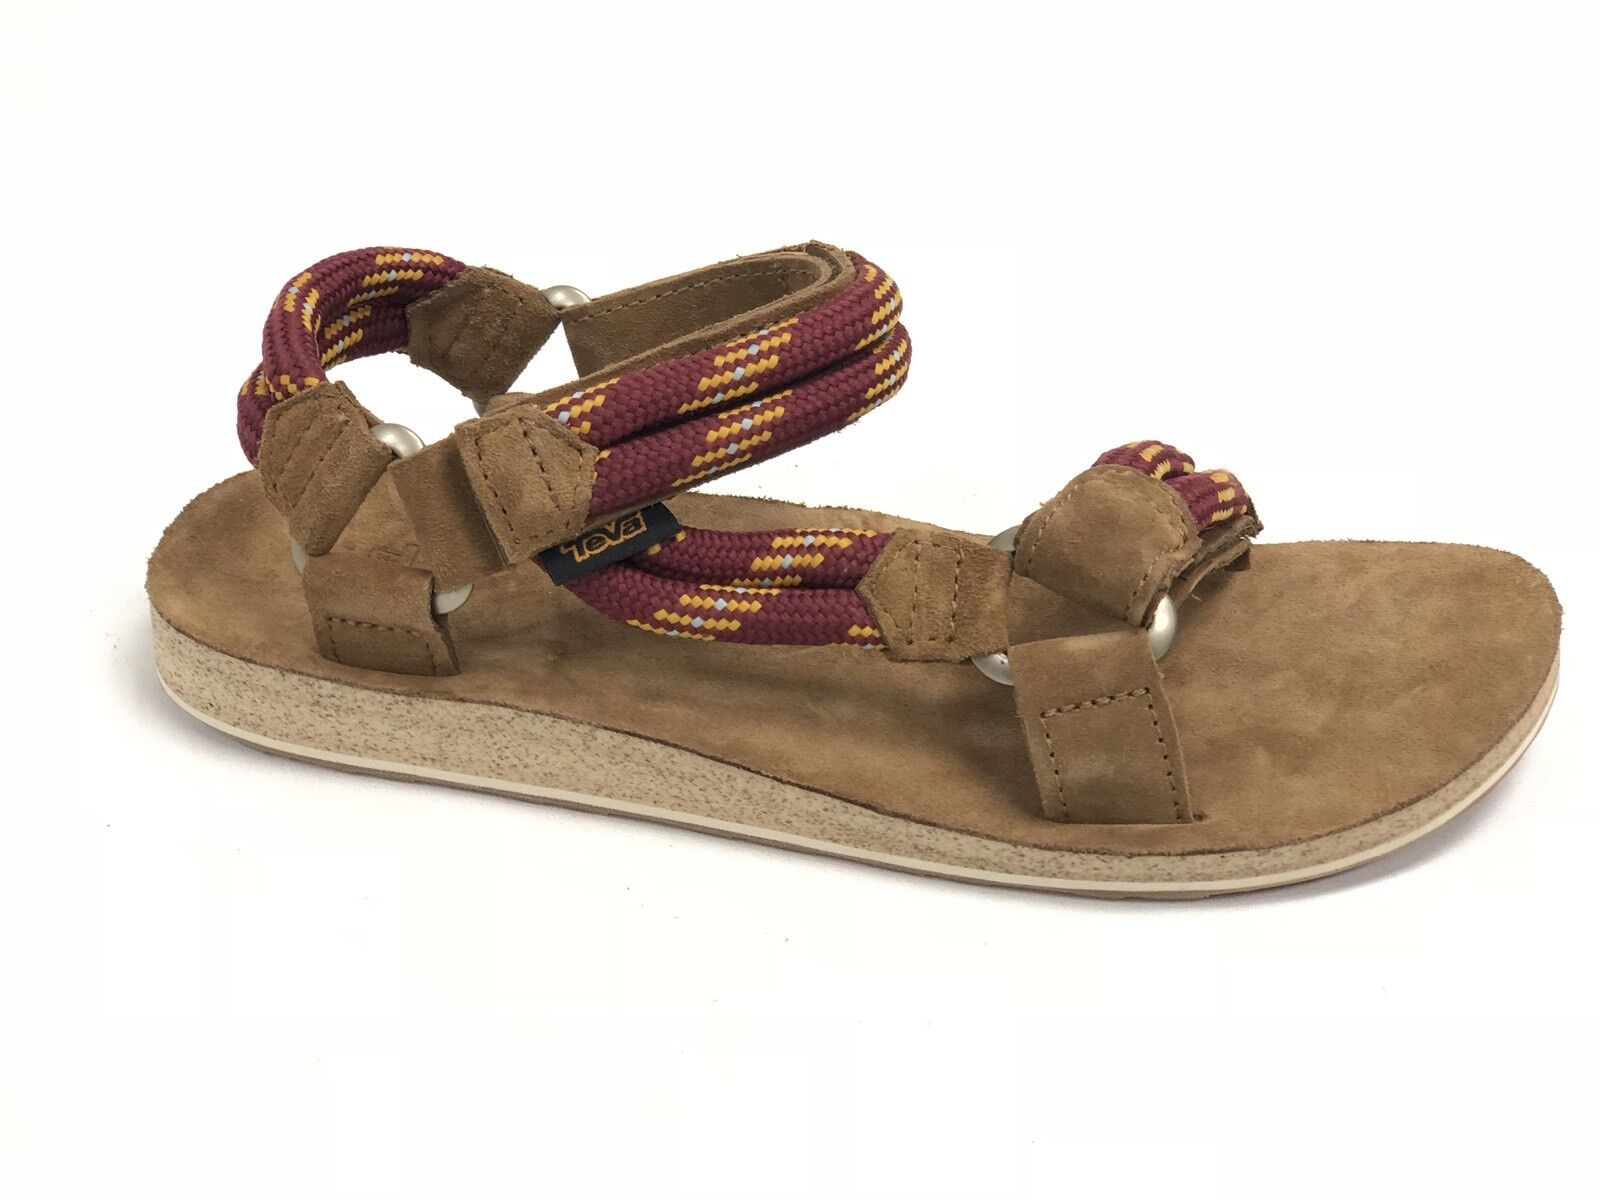 Teva MEN'S Original Universal Rope Suede Footbed Sandals FRIED BRICK 1015189 NEW